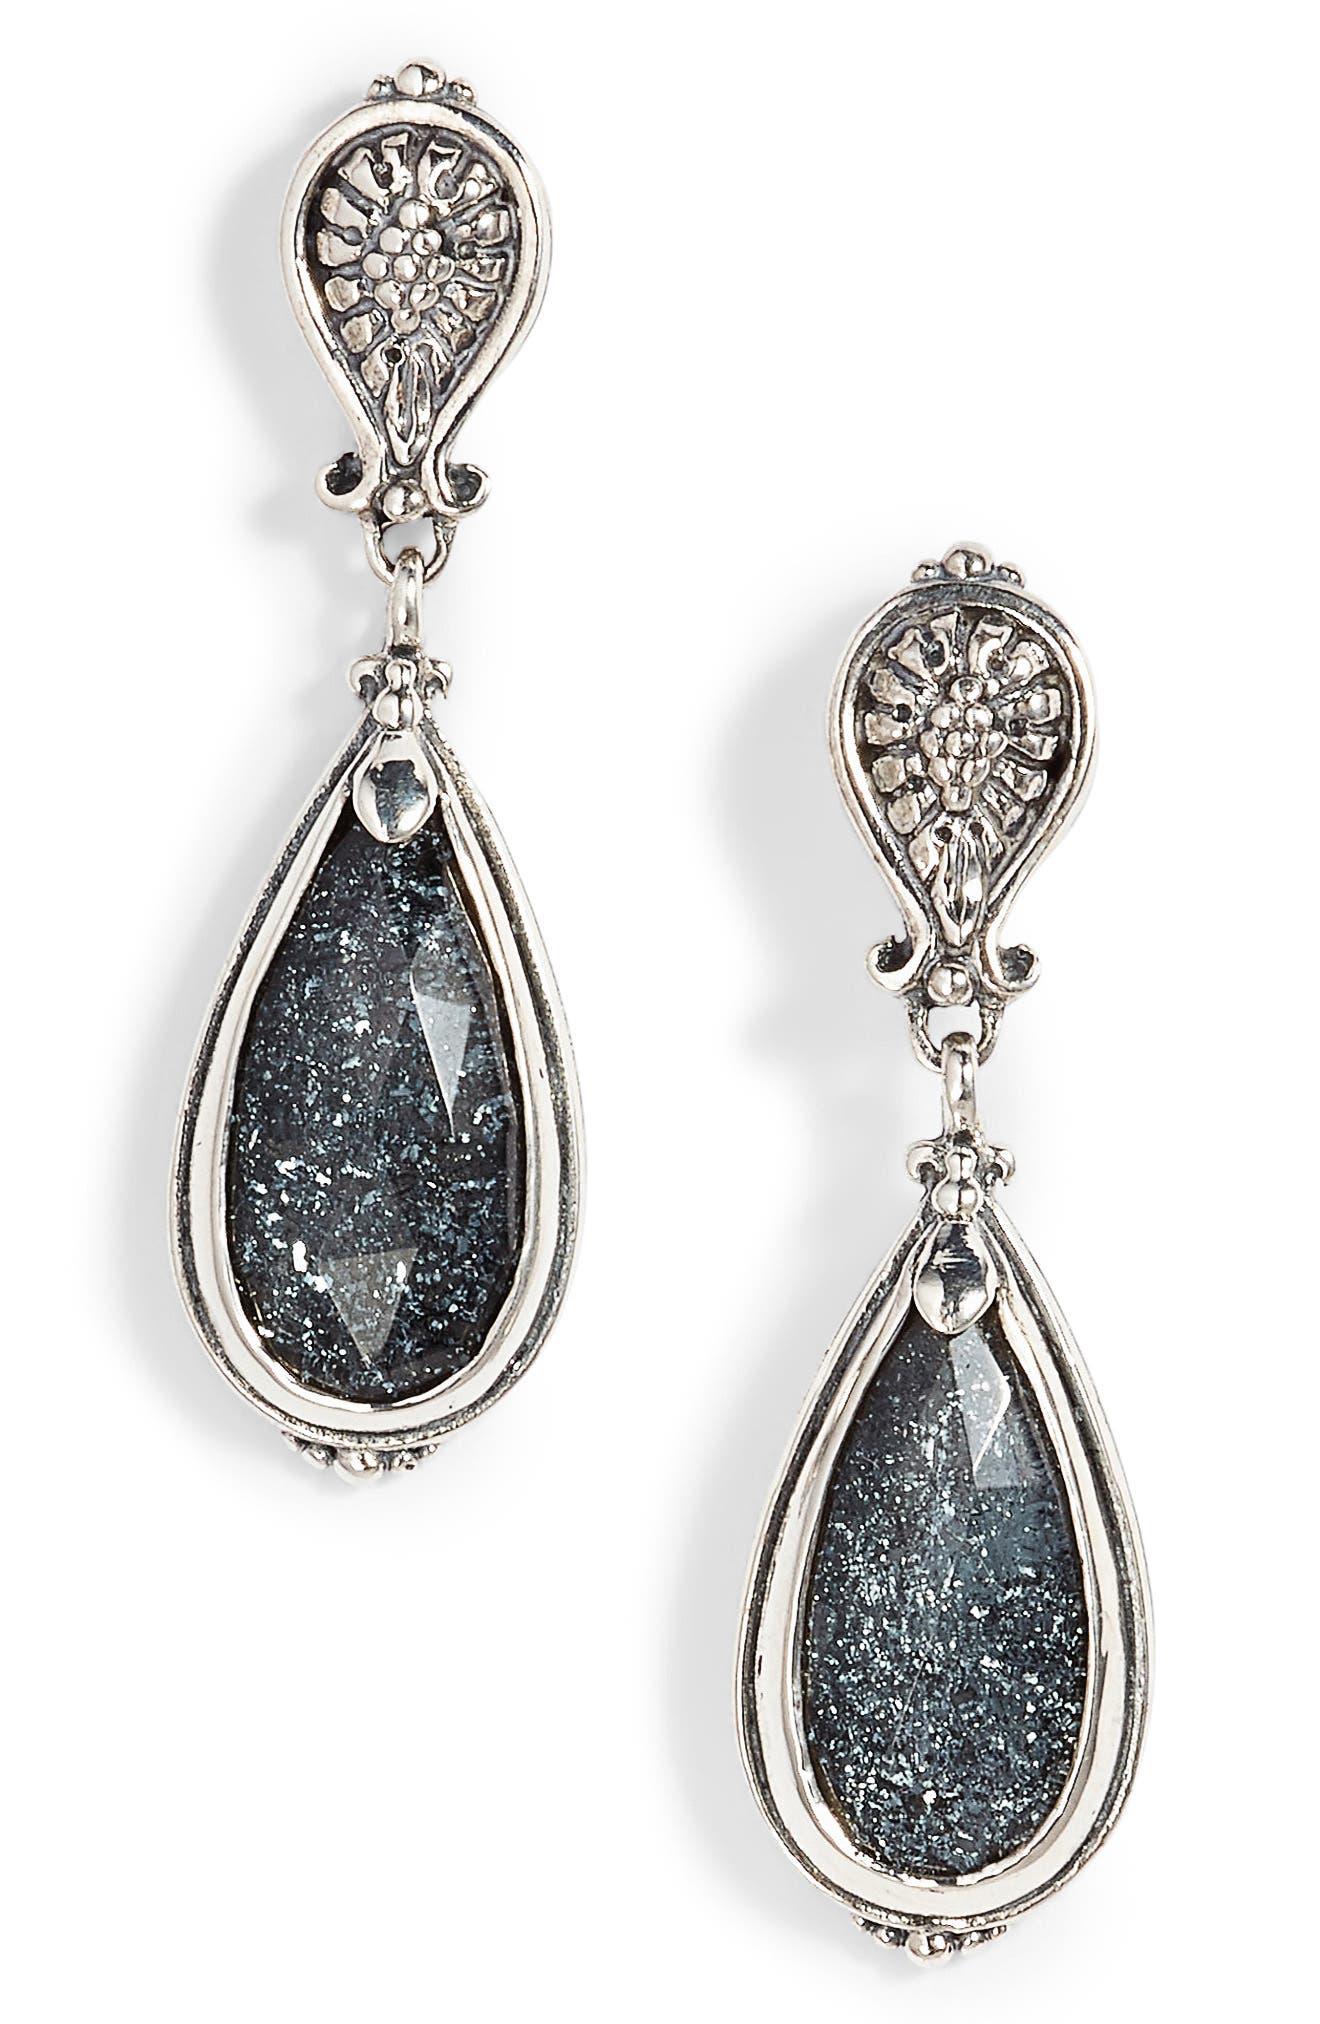 Santorini Spinel Drop Earrings,                             Main thumbnail 1, color,